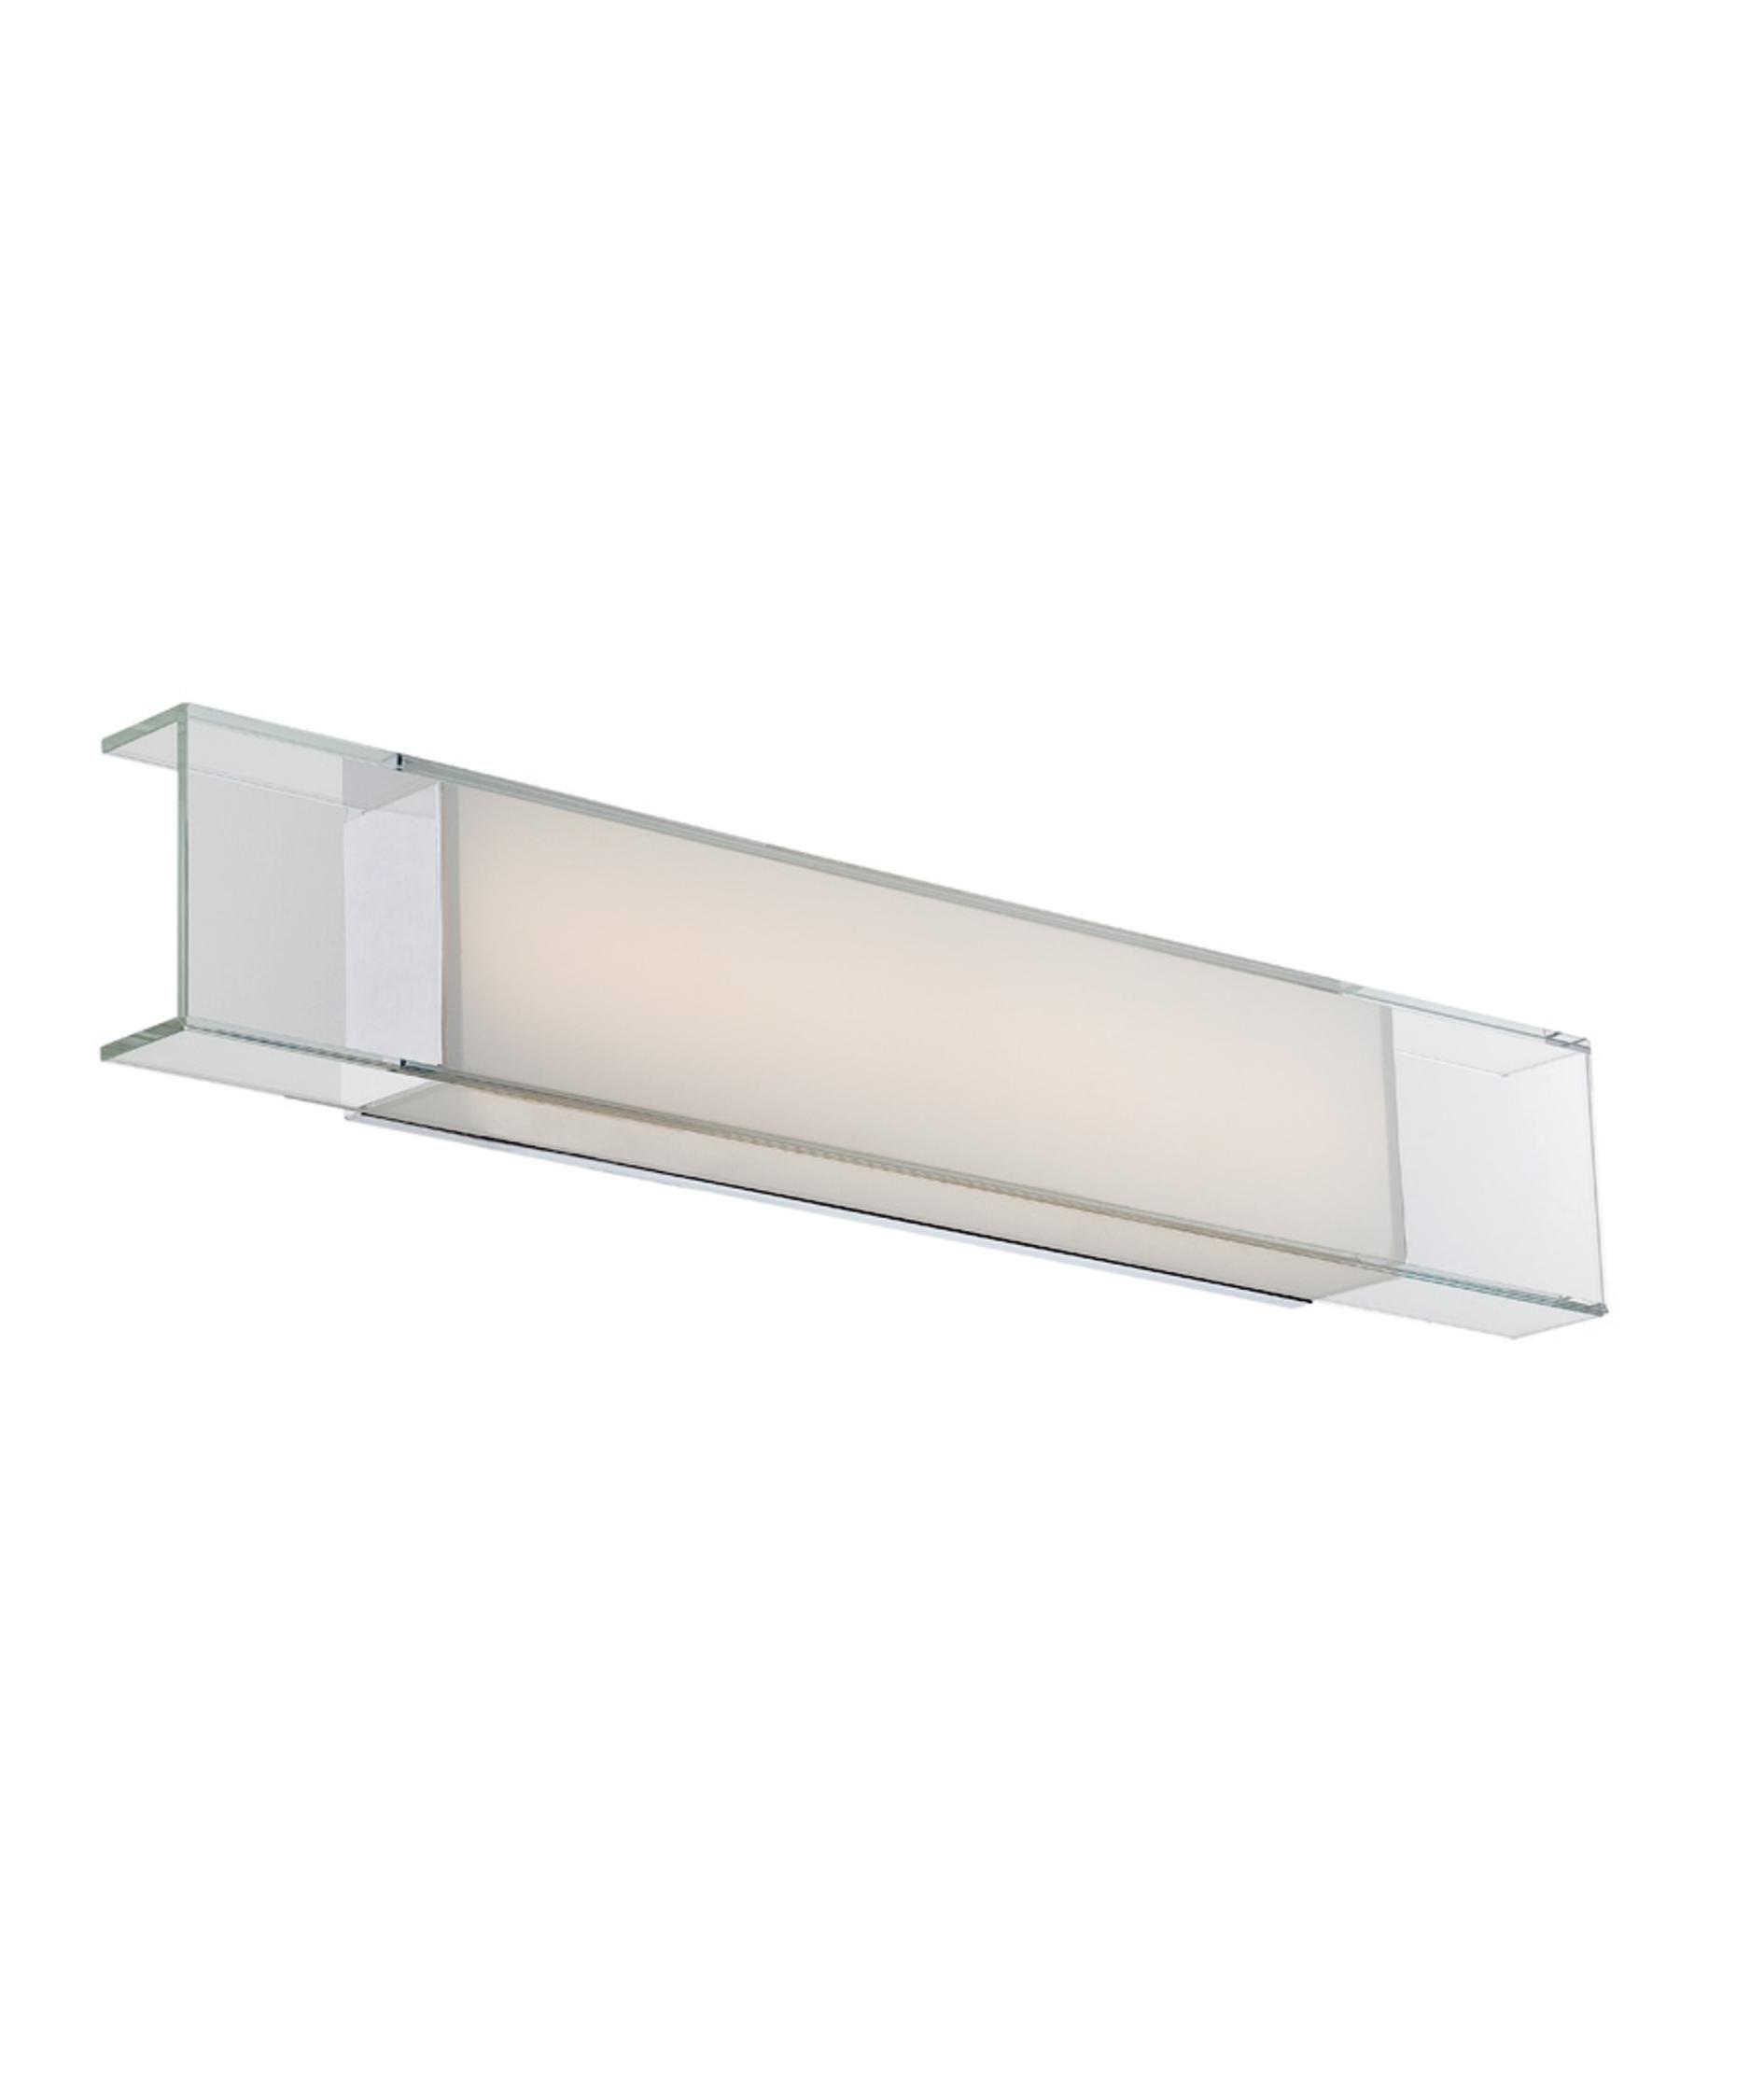 Cloud 20 Inch 1 Light LED Bath Vanity Light by Modern ...